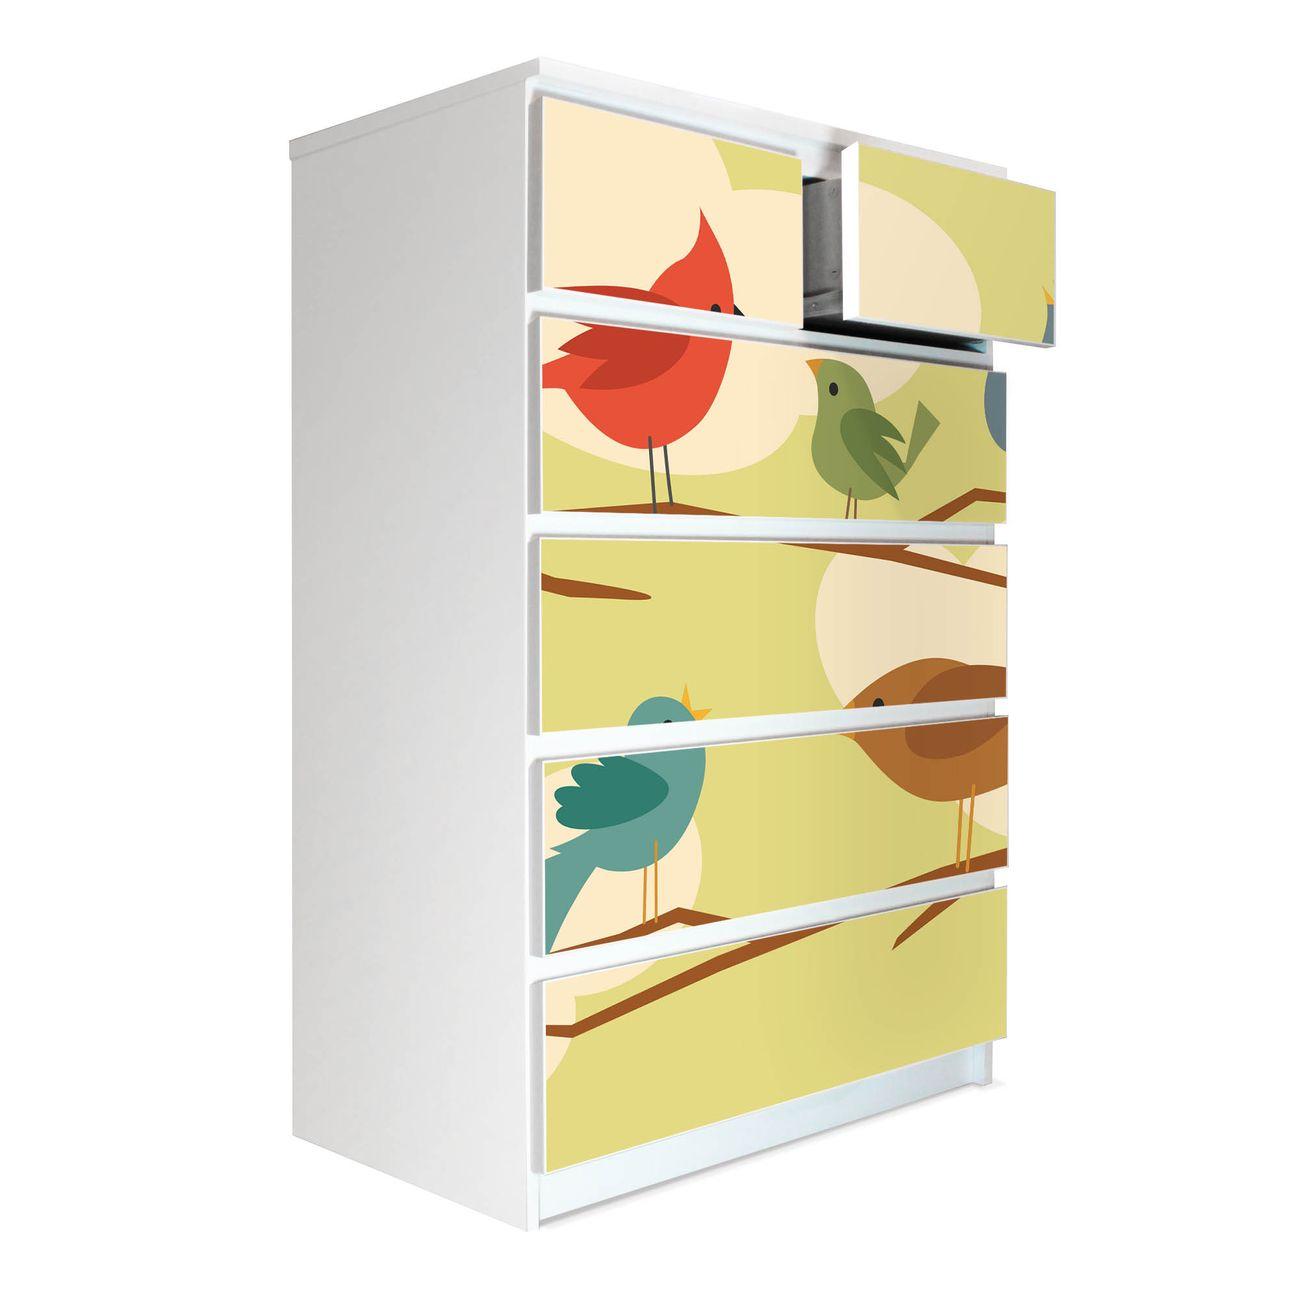 Möbelsticker für Ikea MALM Motiv Fünf Vögel